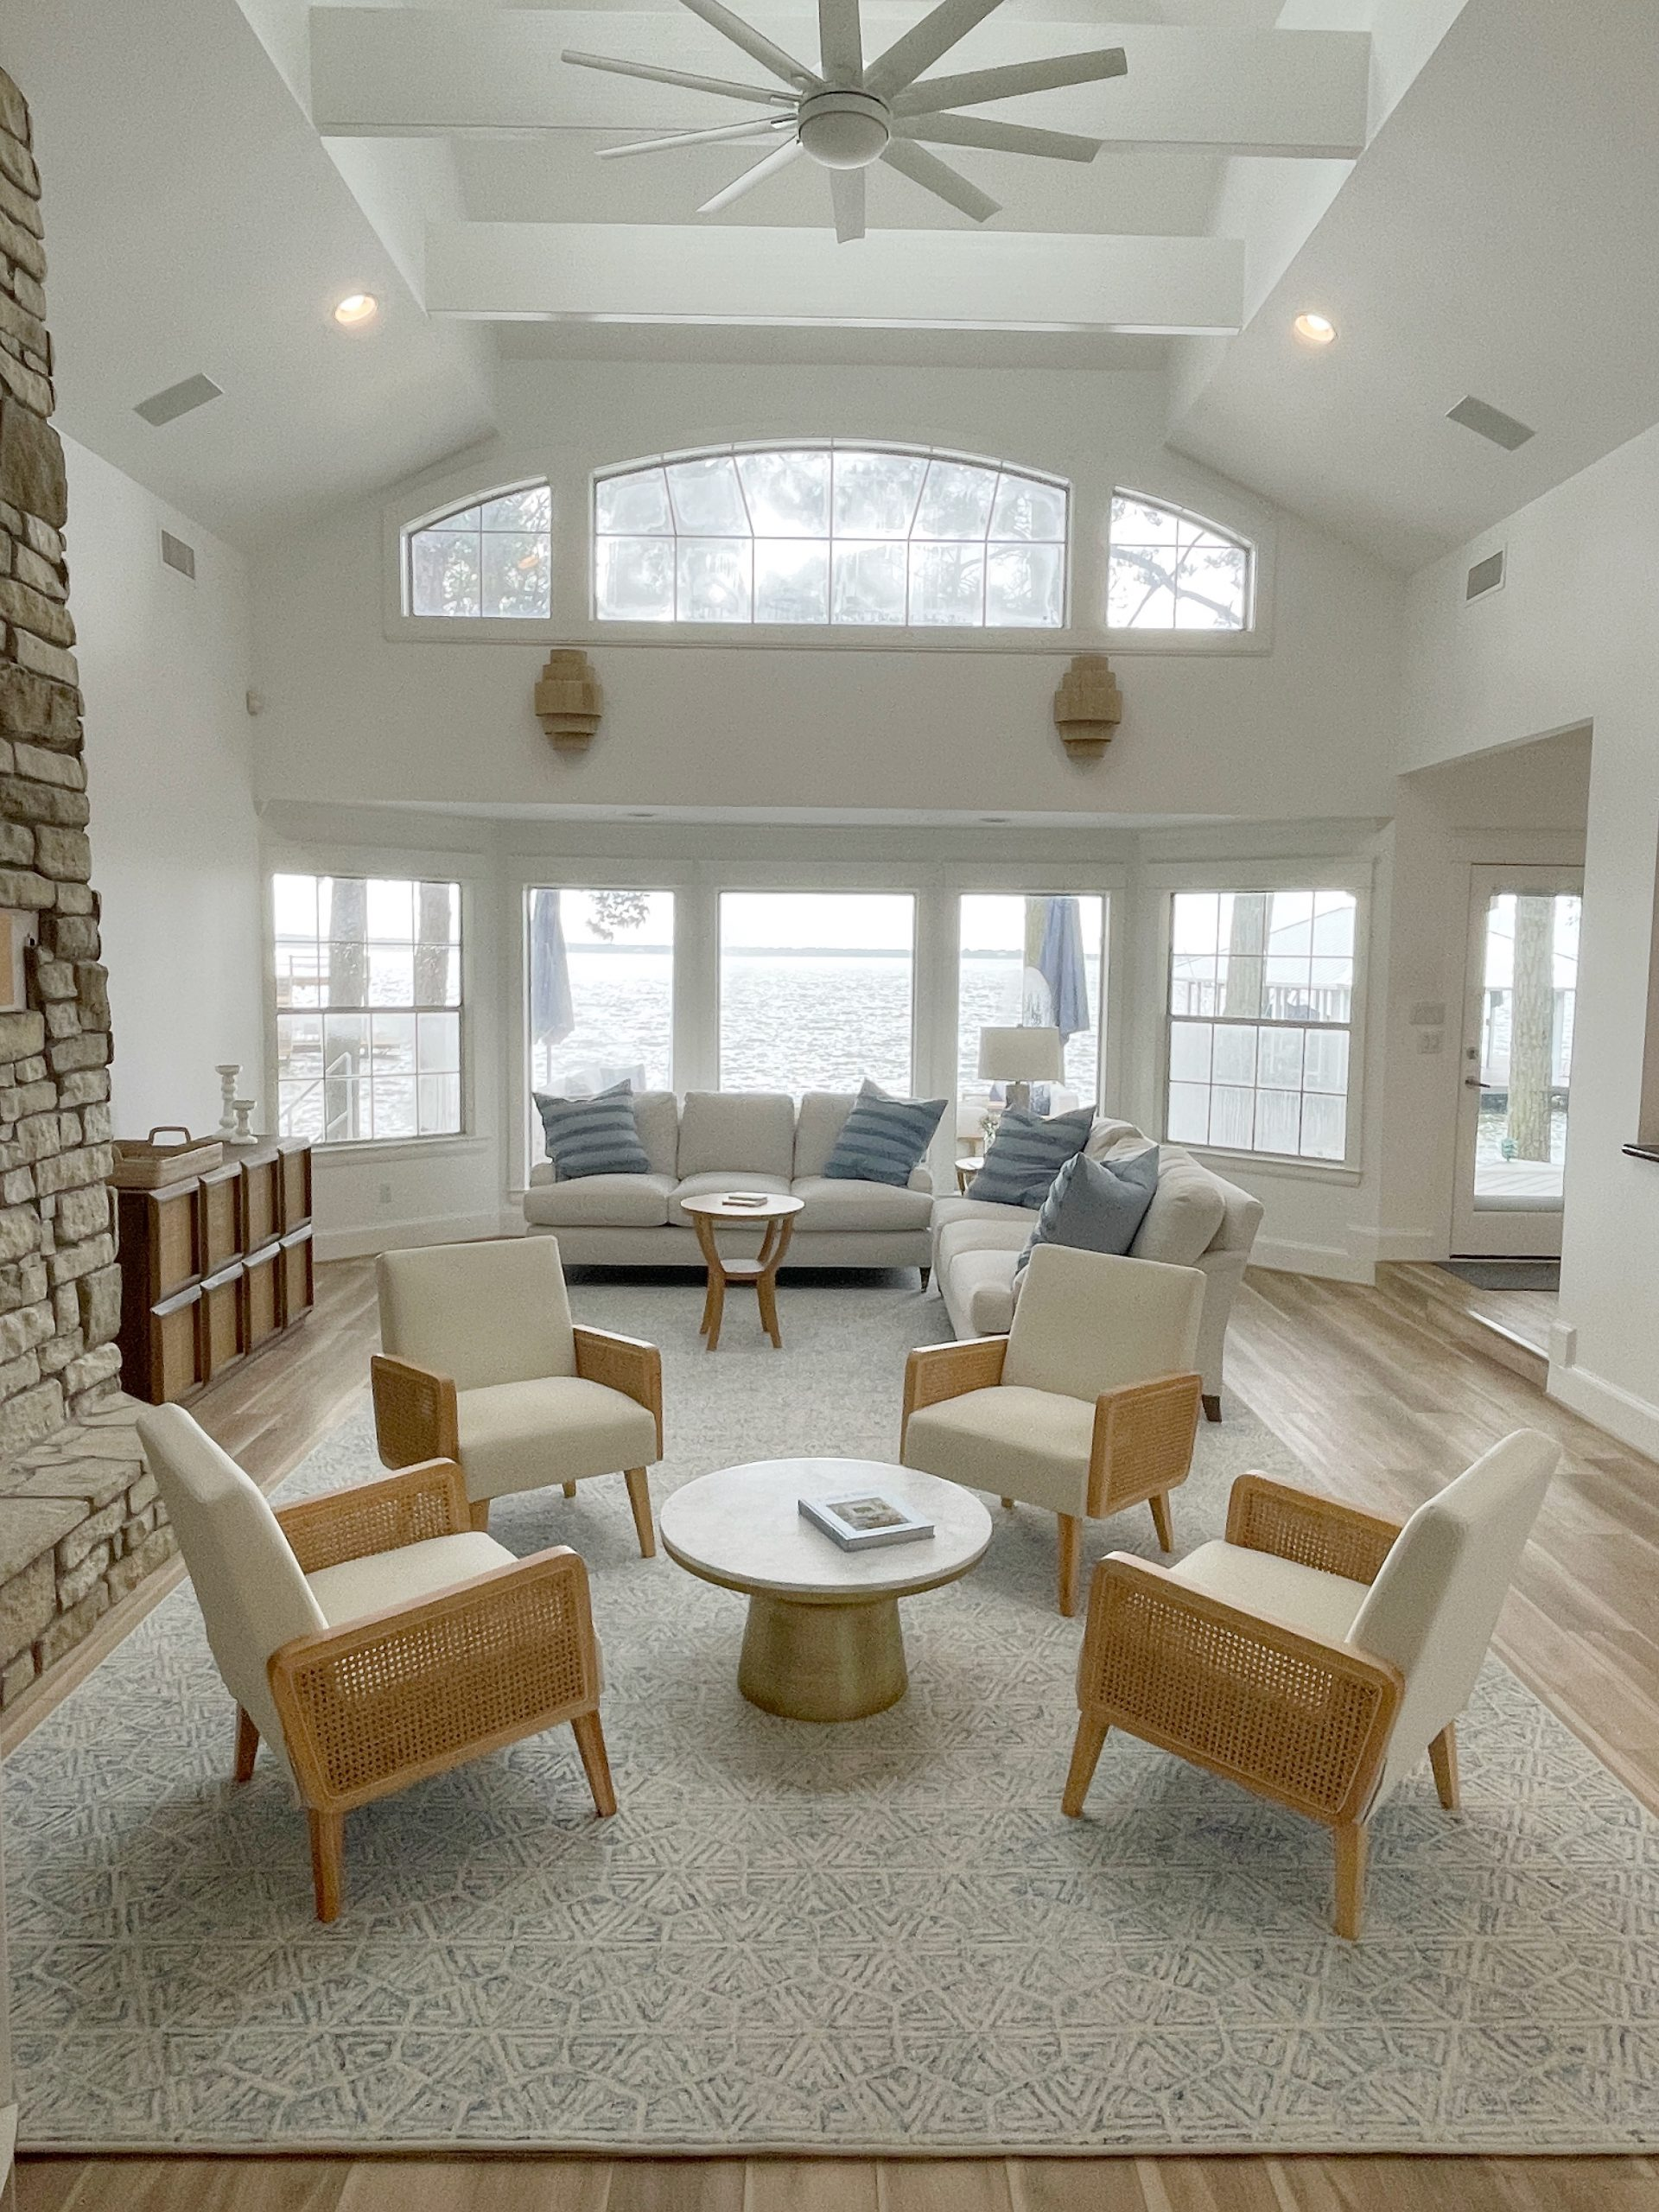 Cedar Creek Lake House Remodel, Alicia Wood Lifestyle